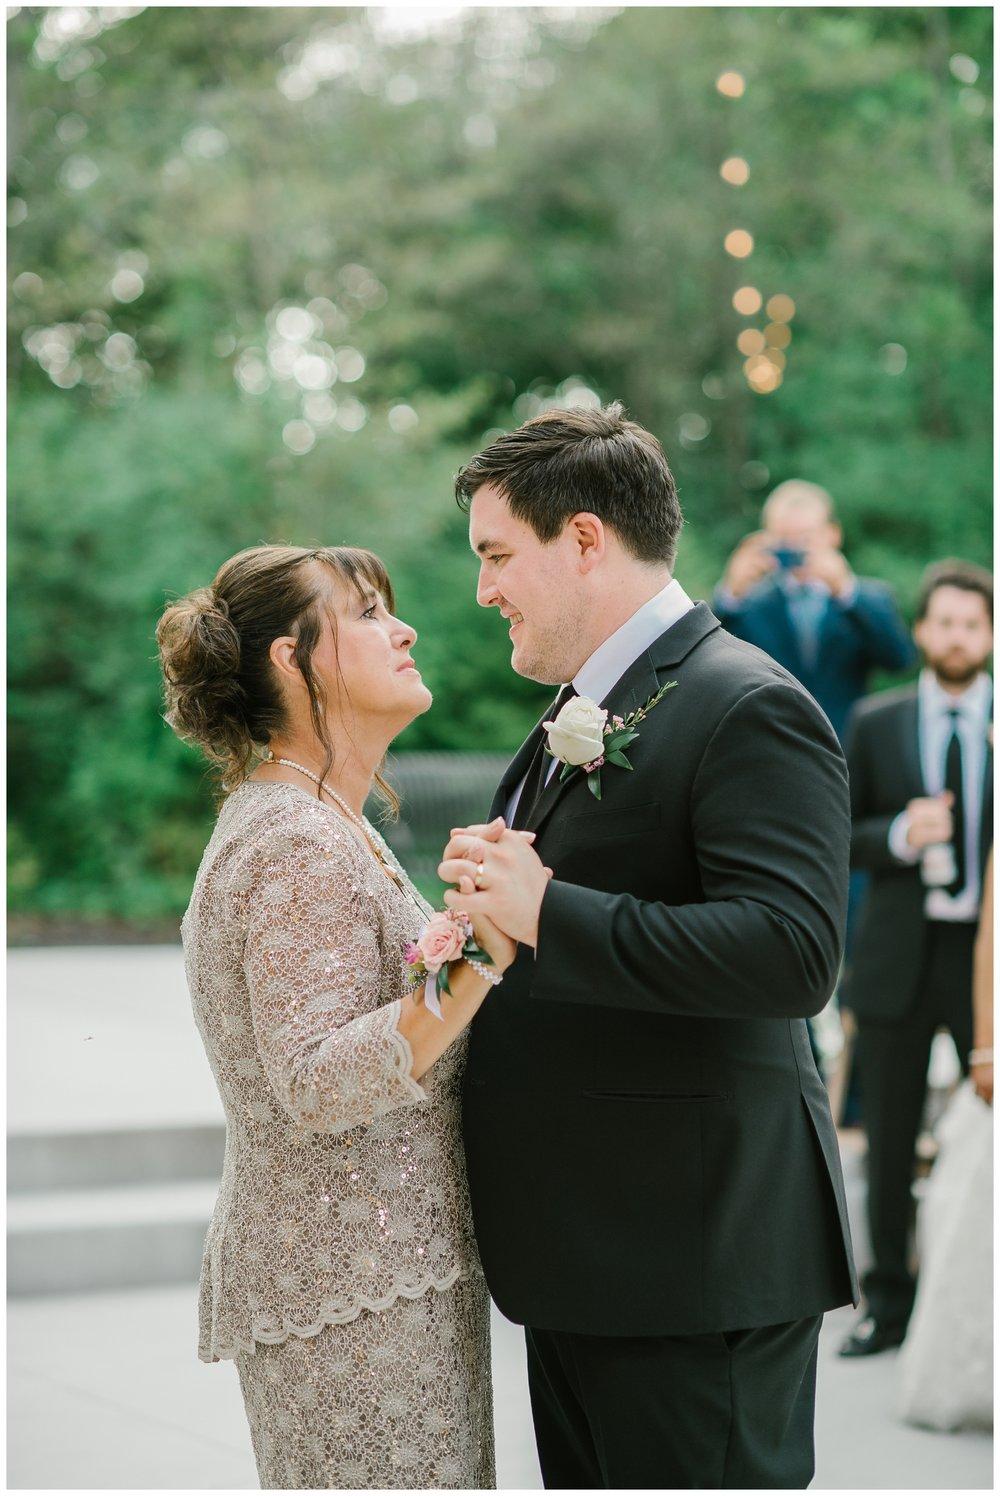 Rebecca_Bridges_Photography_Indianapolis_Wedding_Photographer_6984.jpg